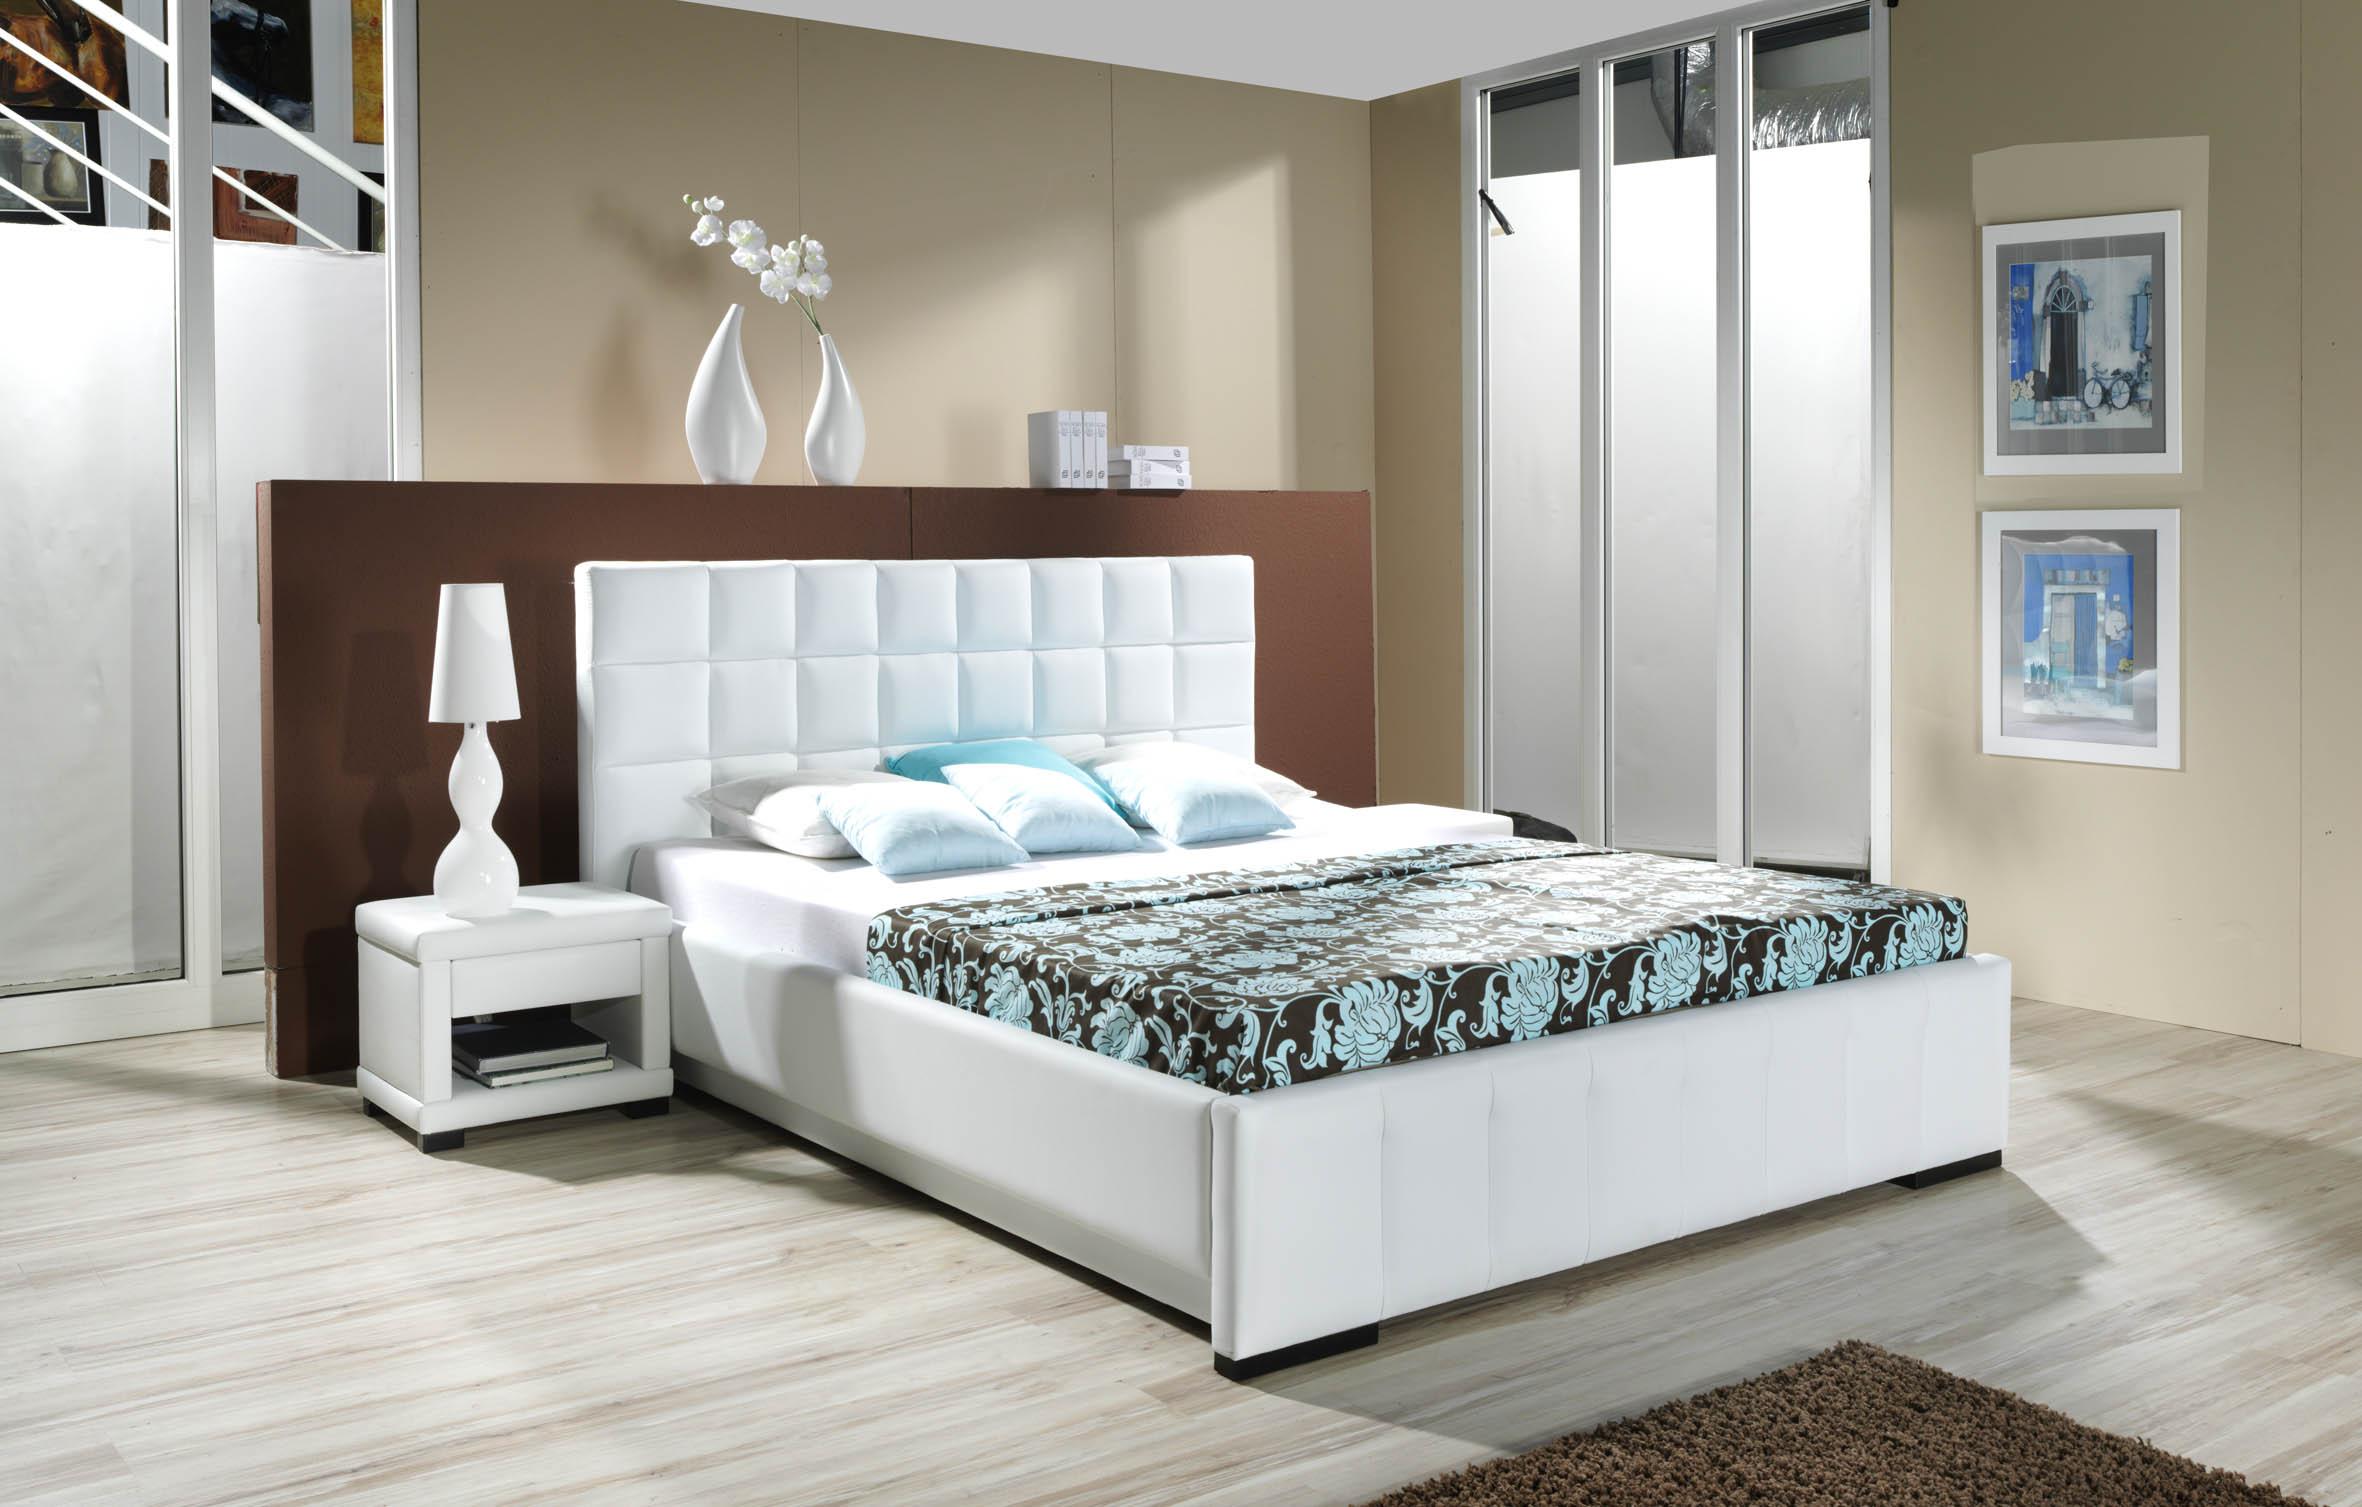 Amazing bedrooms amazing modern bedroom furniture bedroom furniture sale furniture  master bedroom master bedroom furniture designs